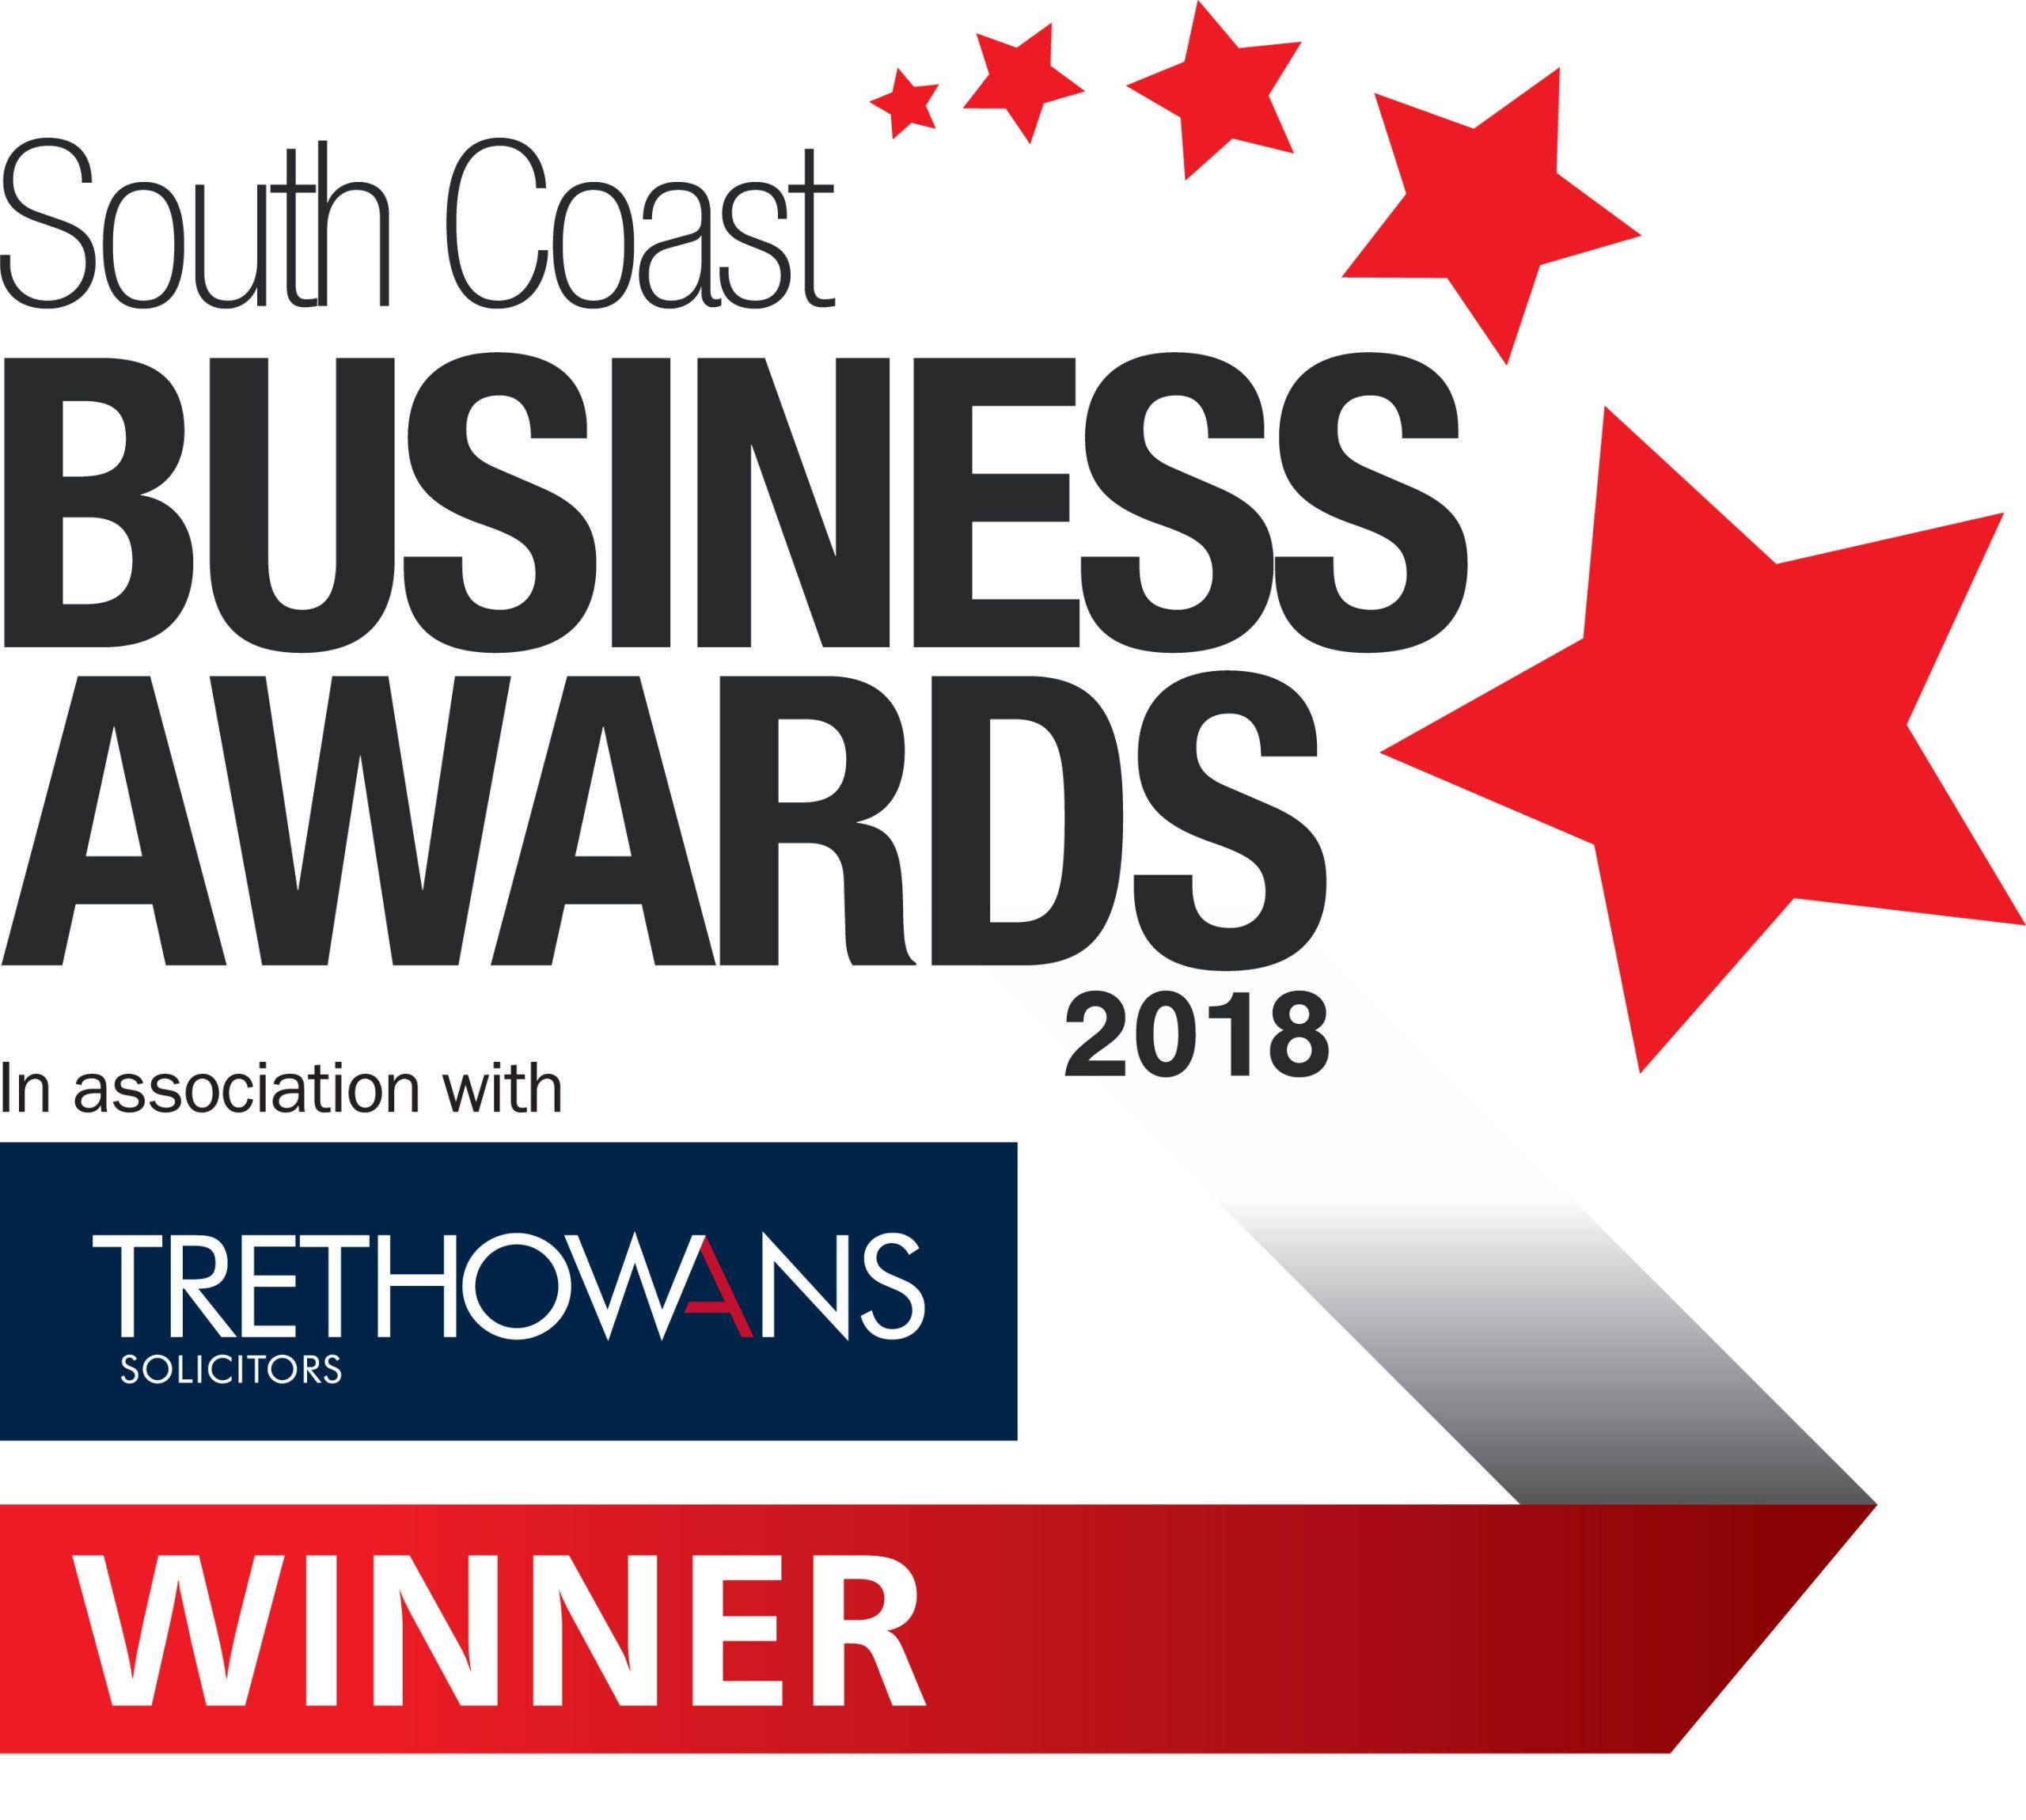 South Coast Business Awards – Winners